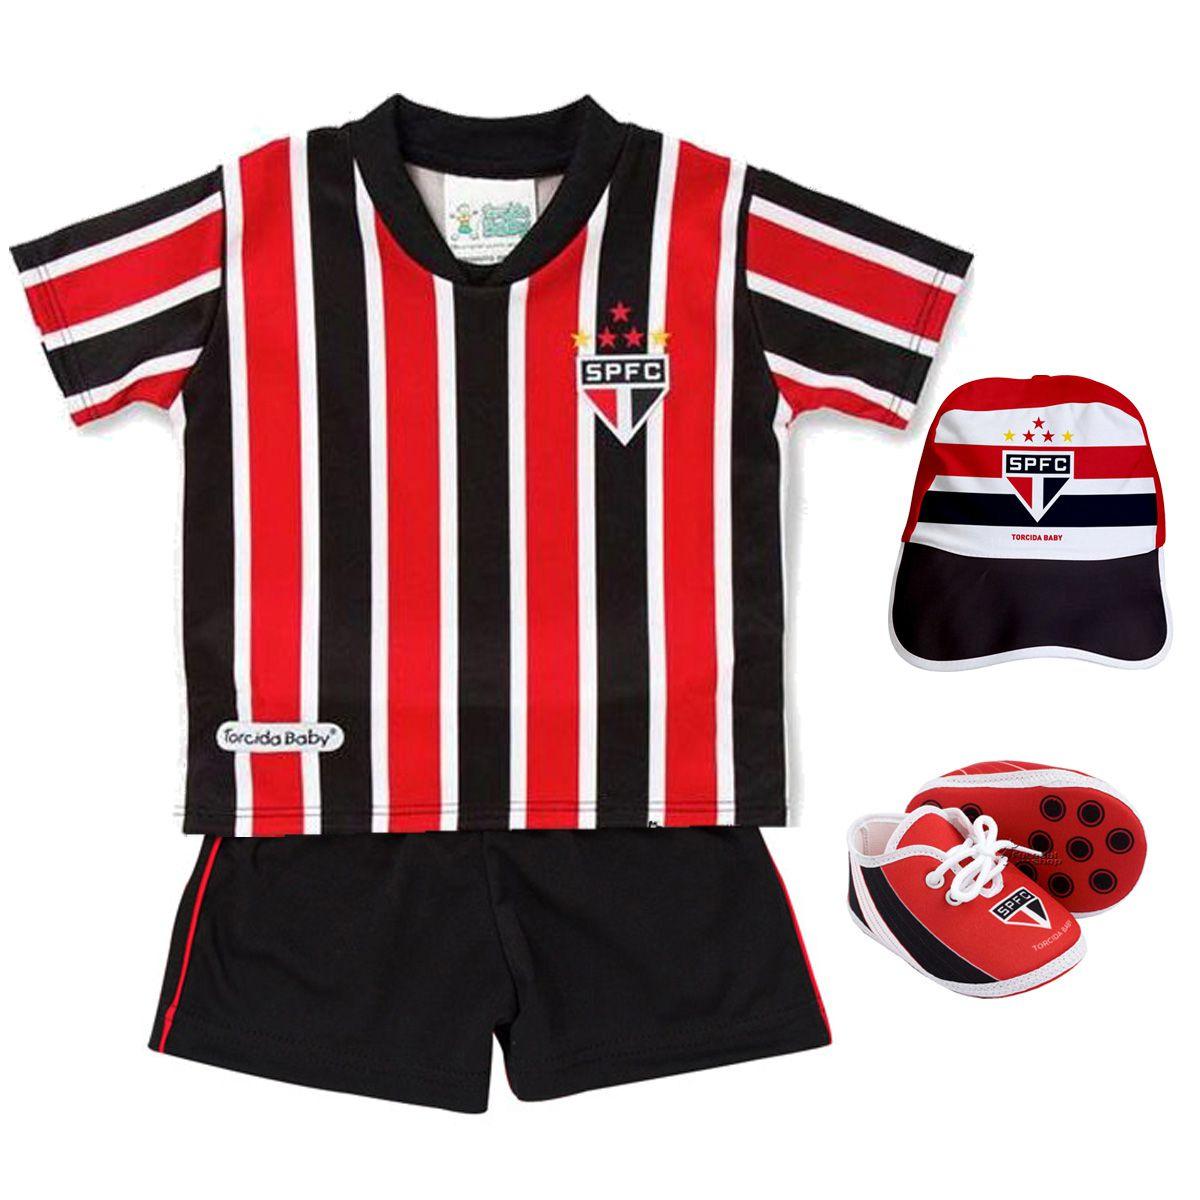 Kit Uniforme Bebê do São Paulo Torcida Baby - 015s